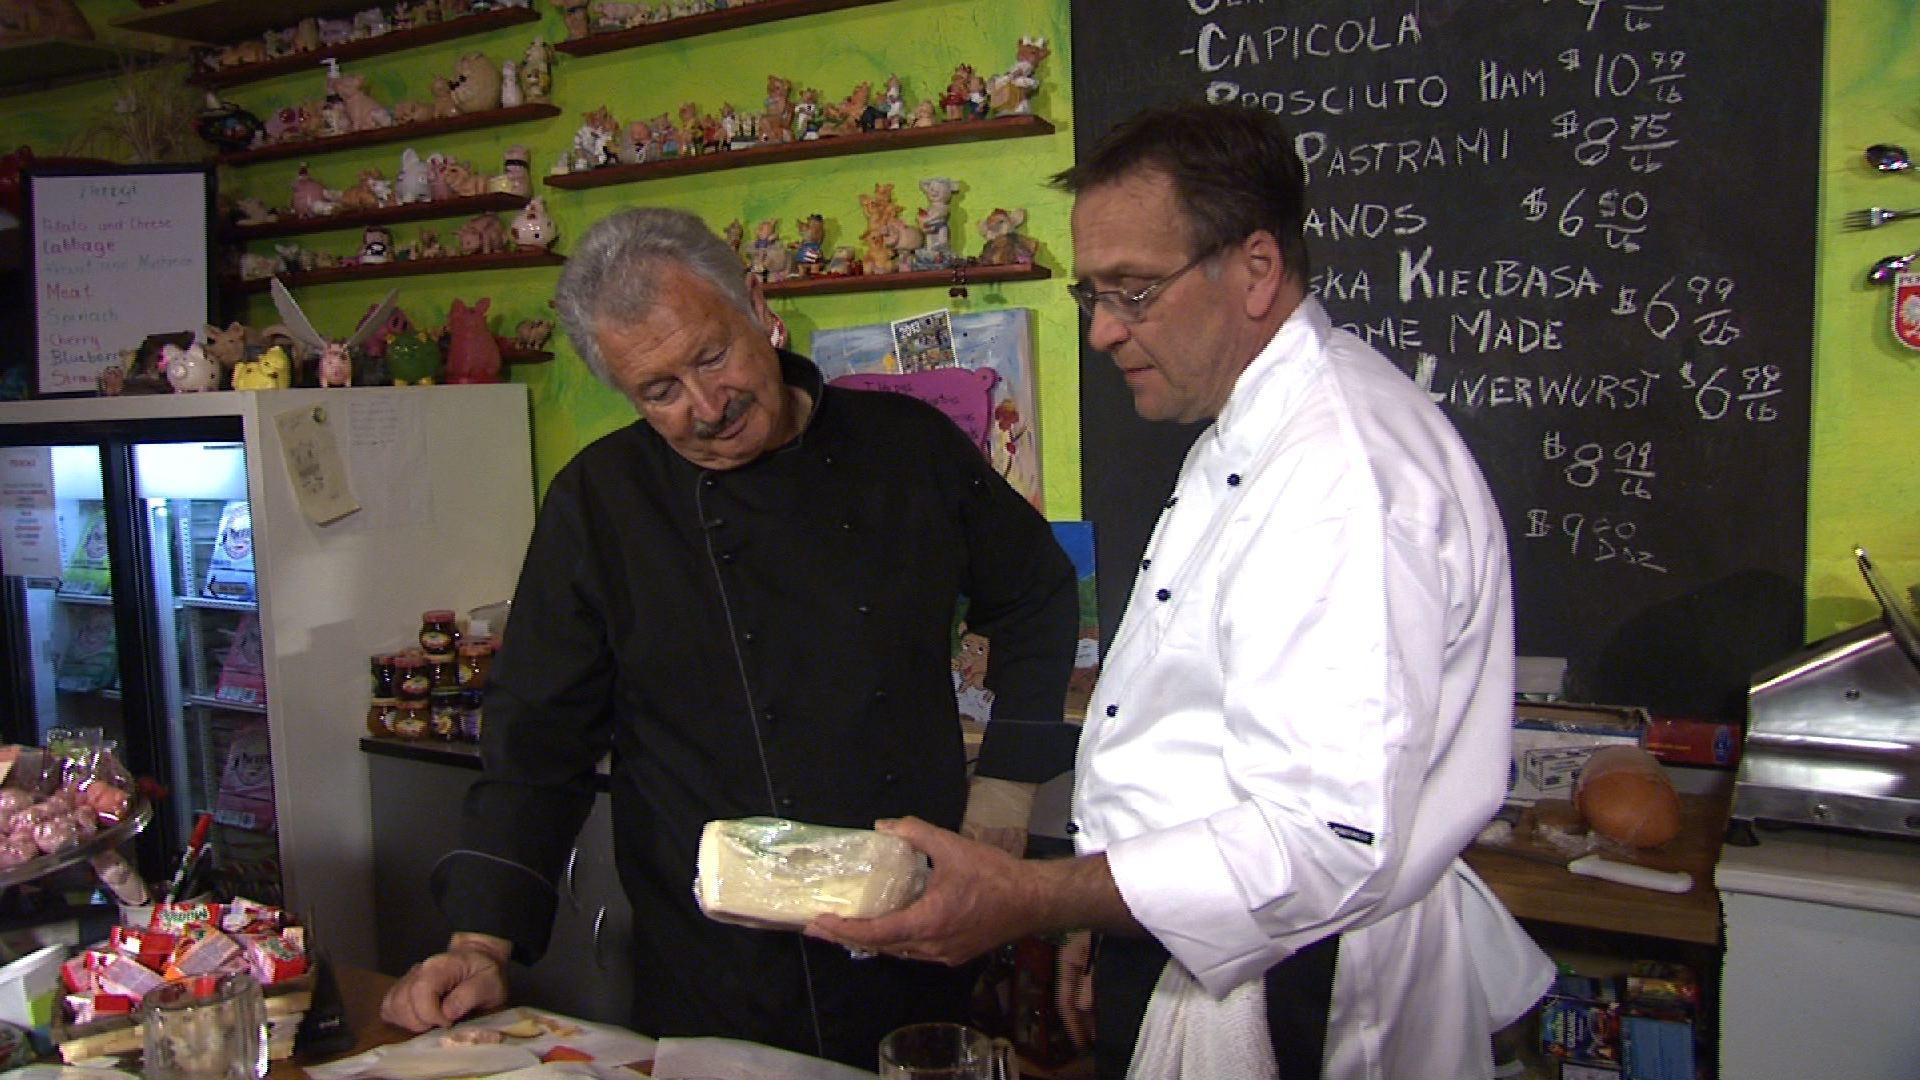 Oak Ridge: The Soup Kitchen, Dean's, Razzleberry's image